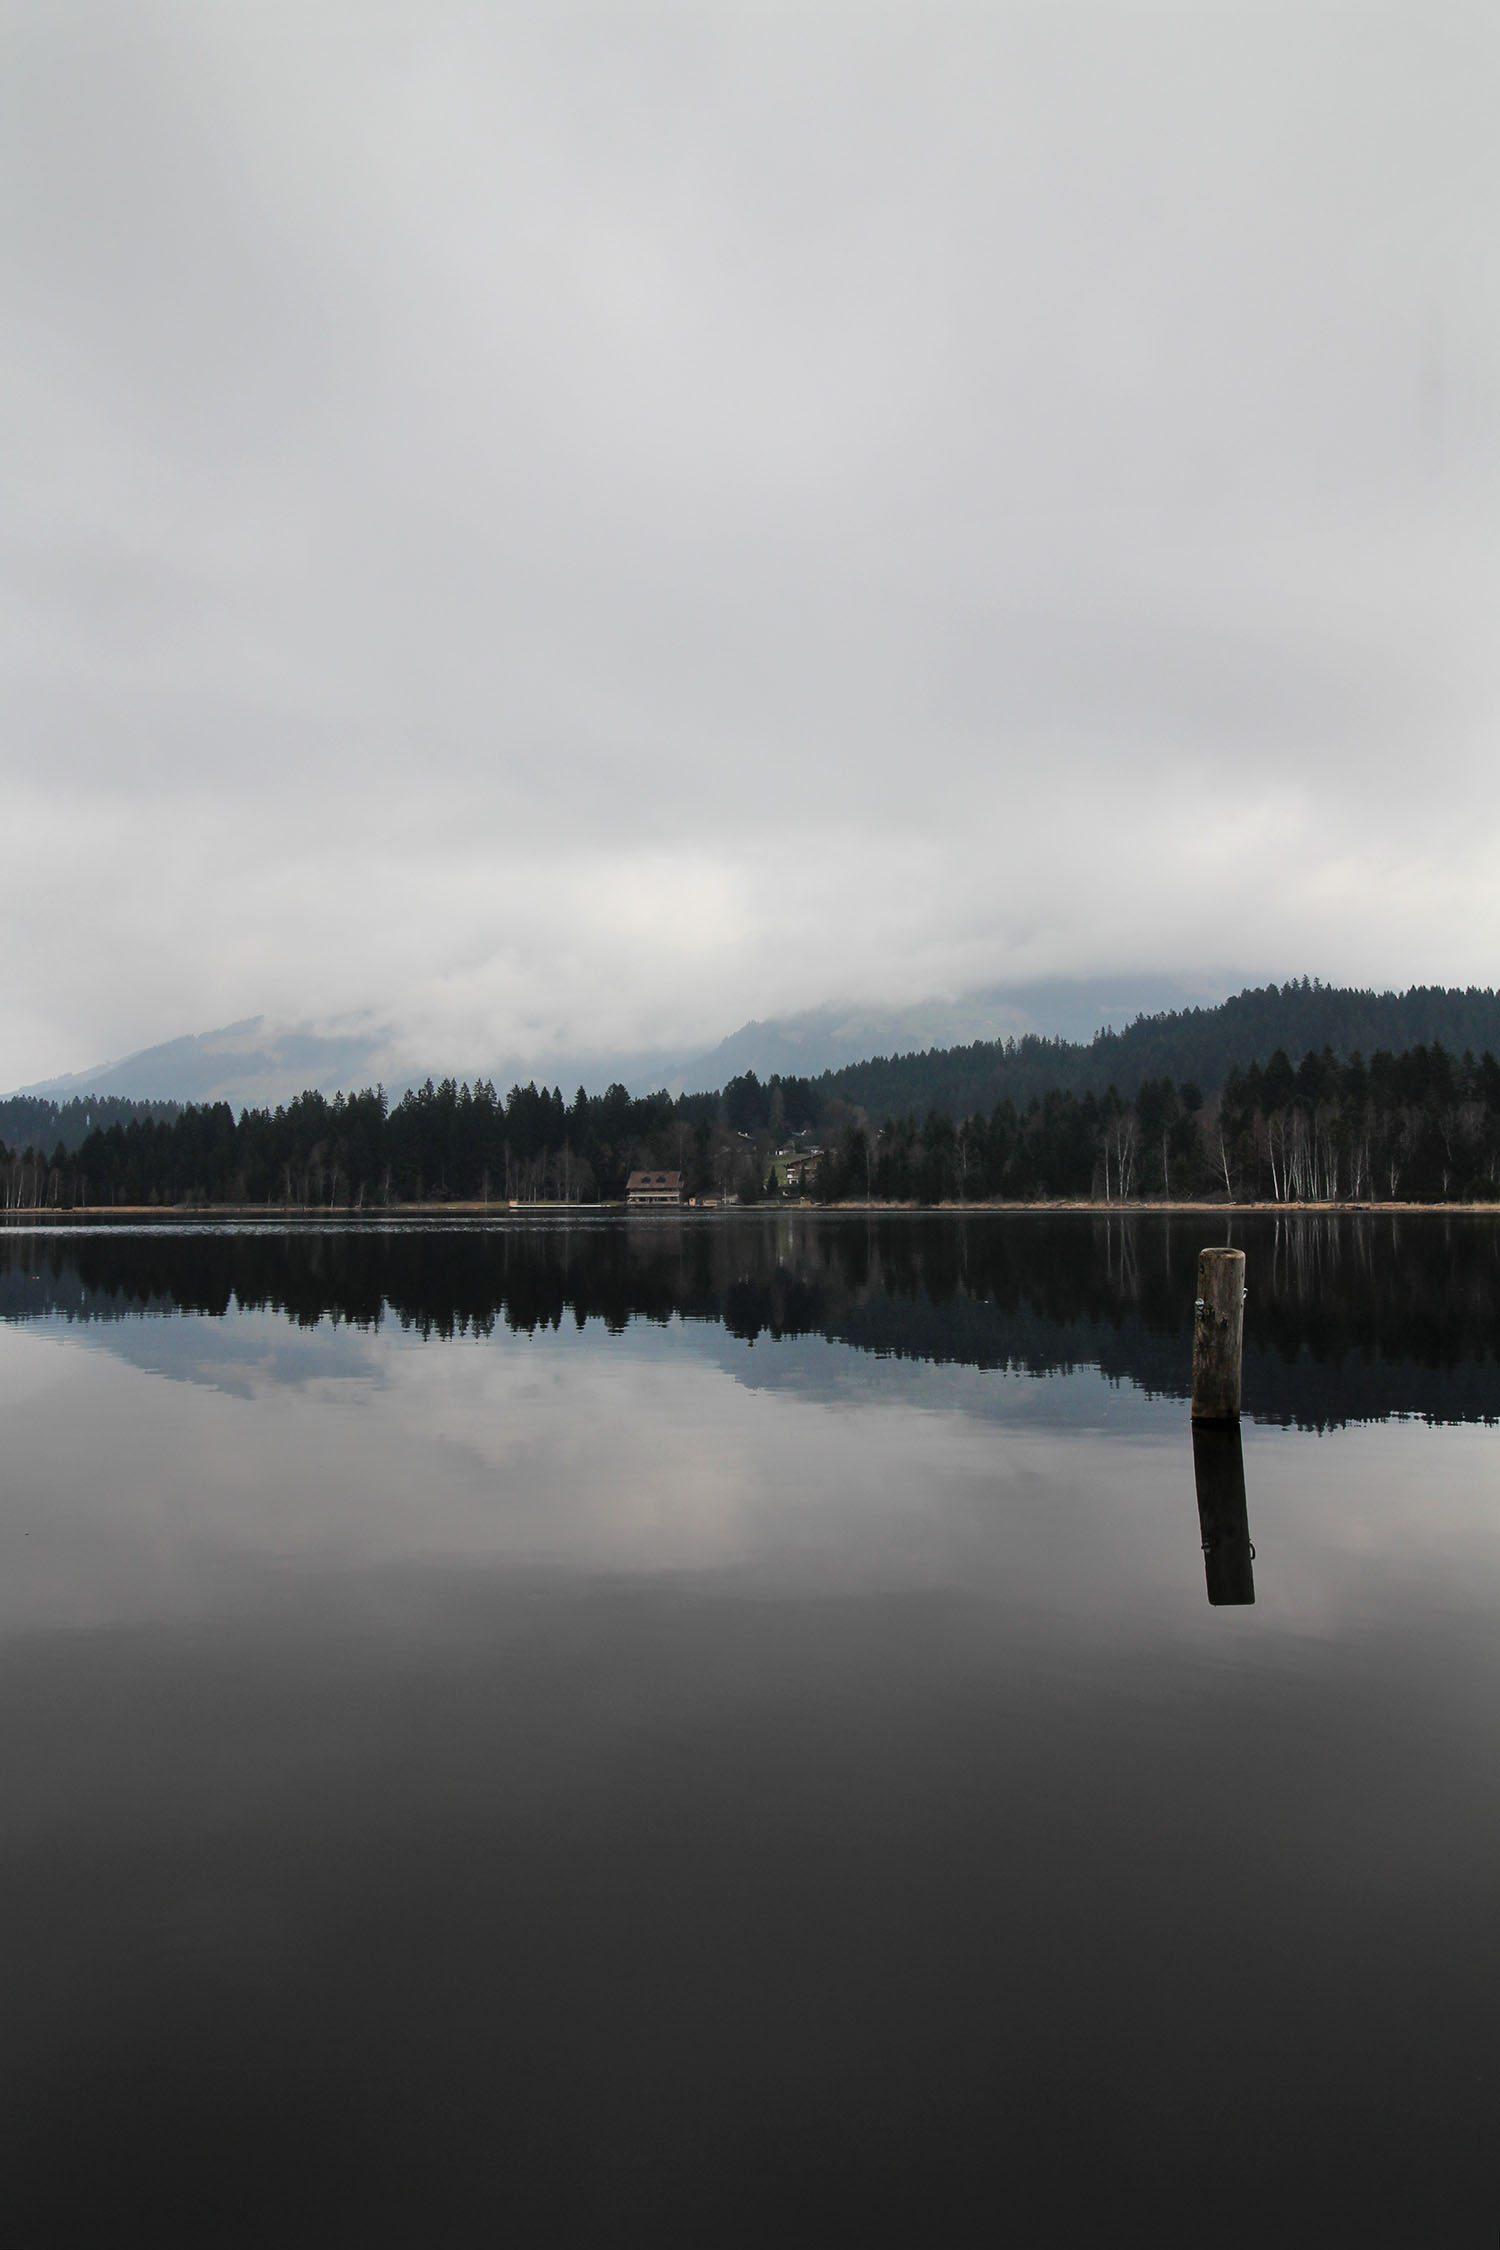 SchwarzSee Lake Kitzbuhel Austria